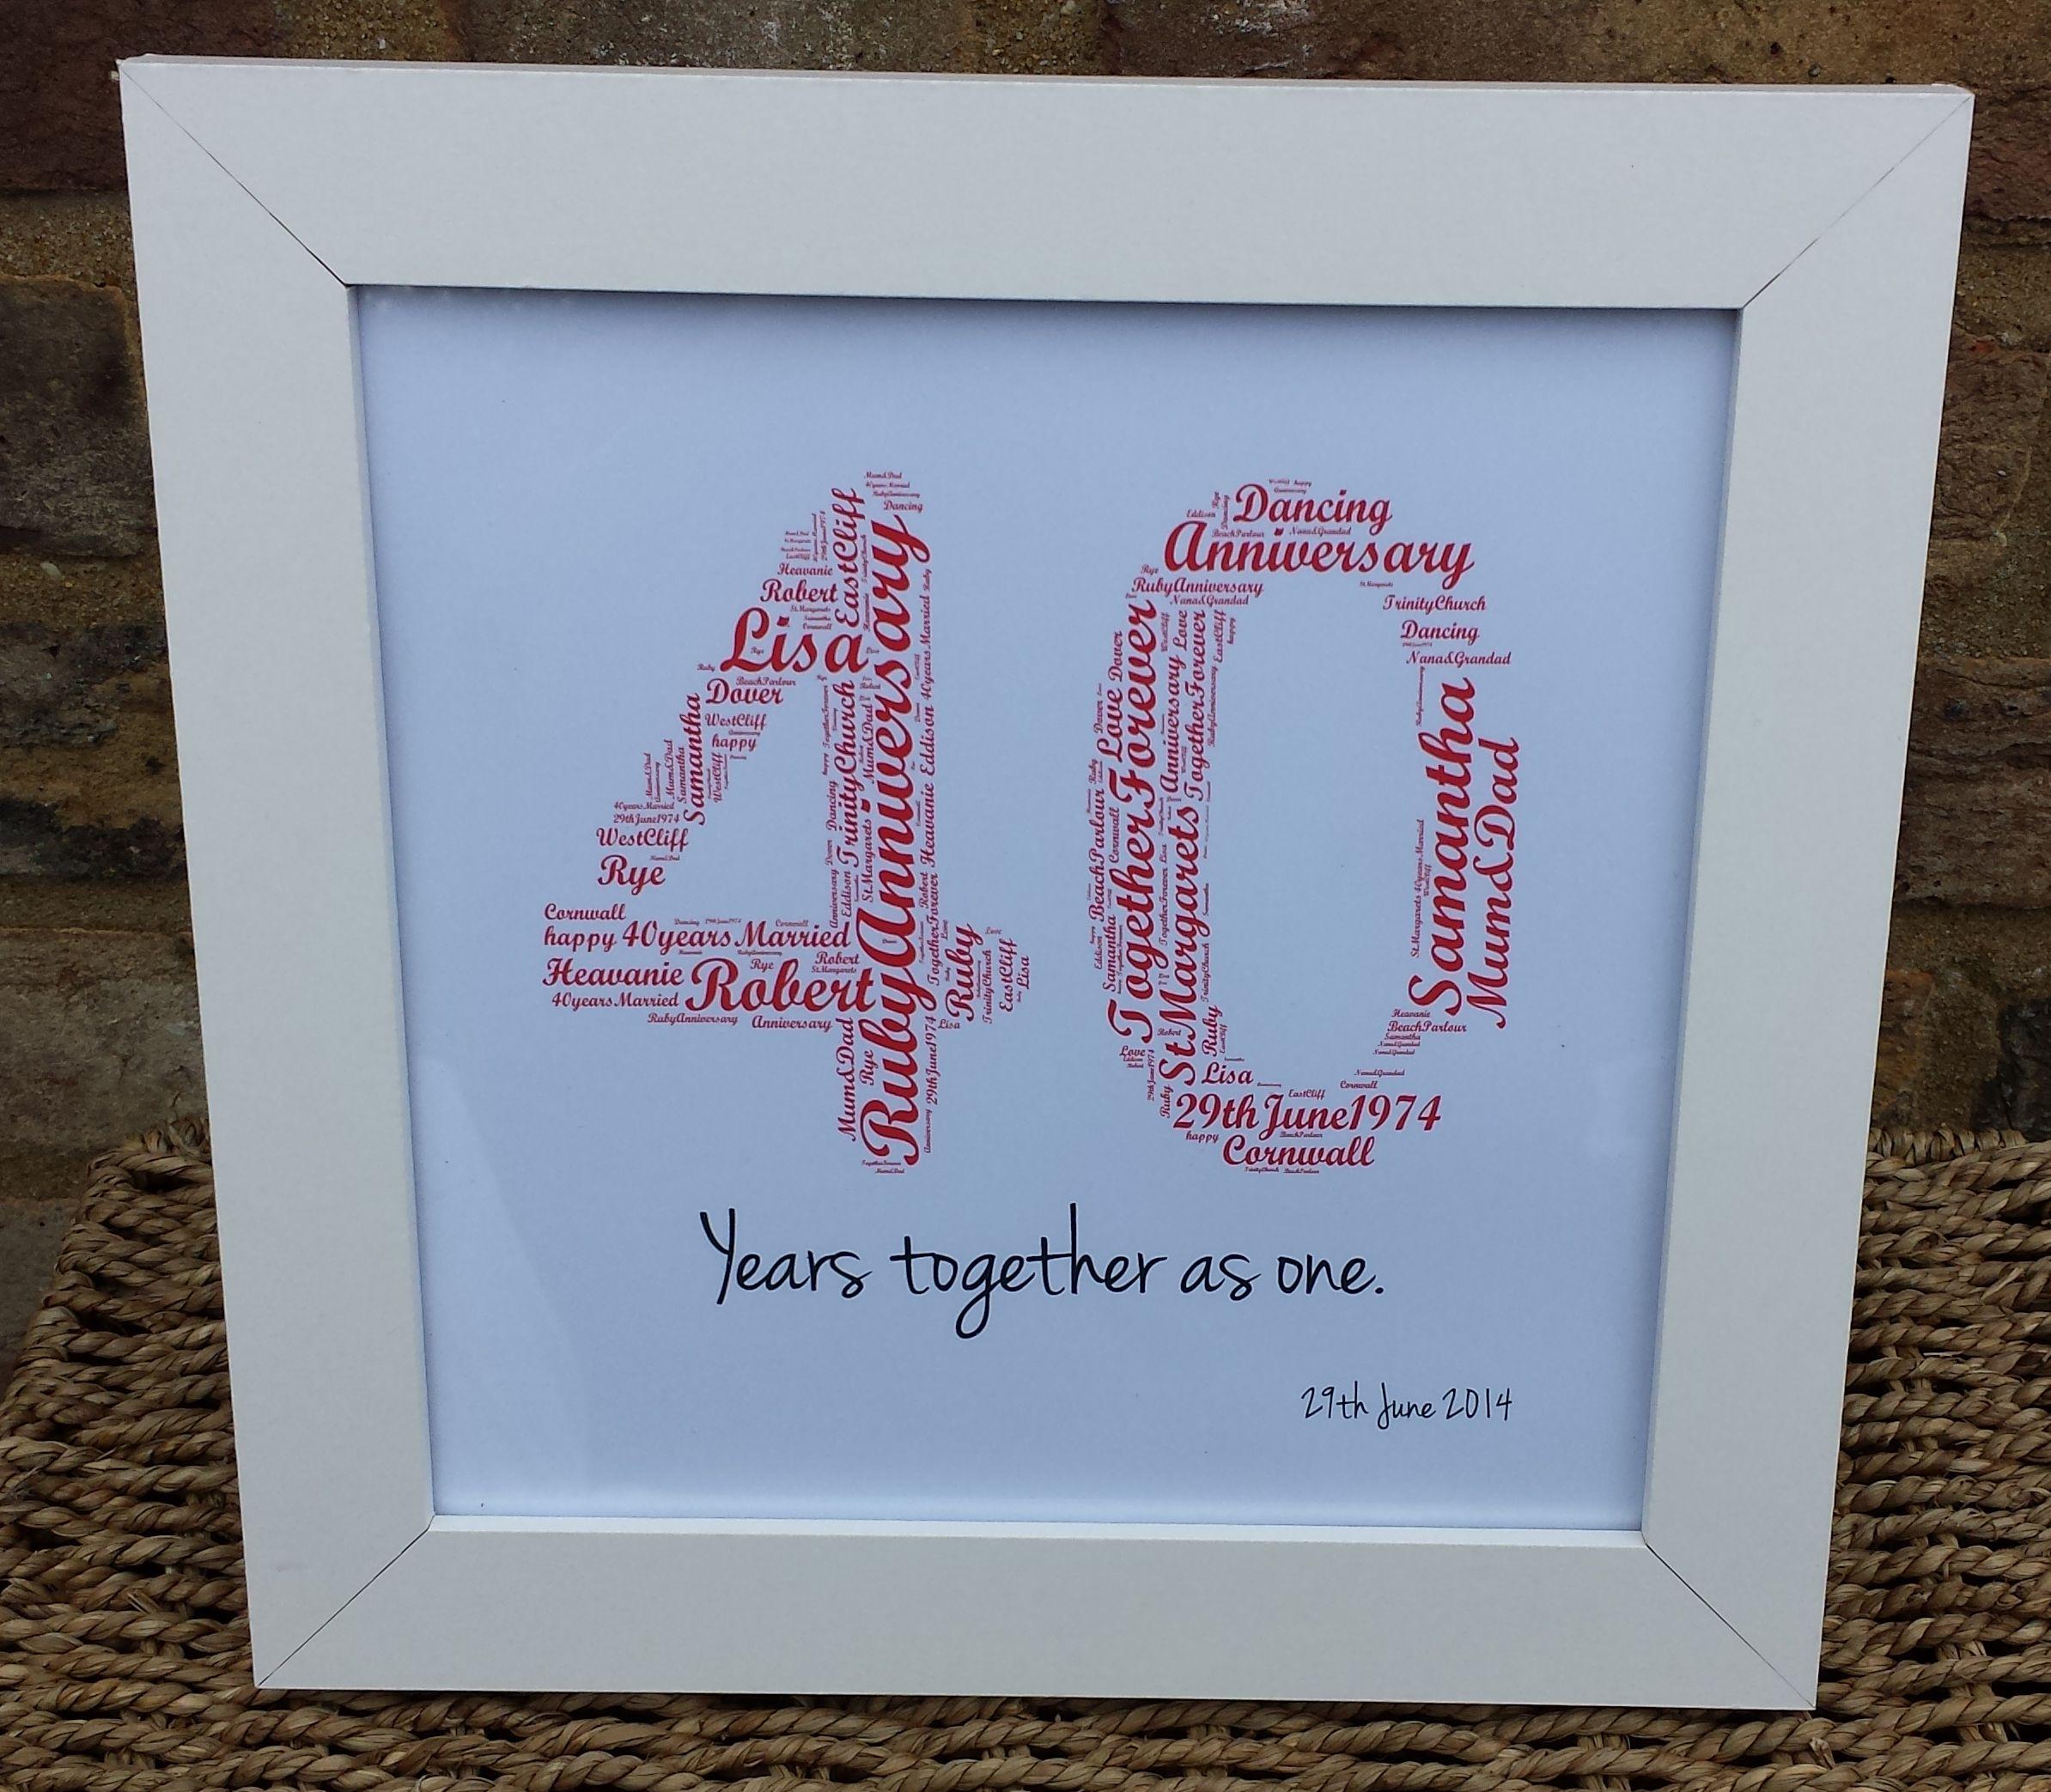 '40 Years Together as one' Word Art Ruby Wedding Разное